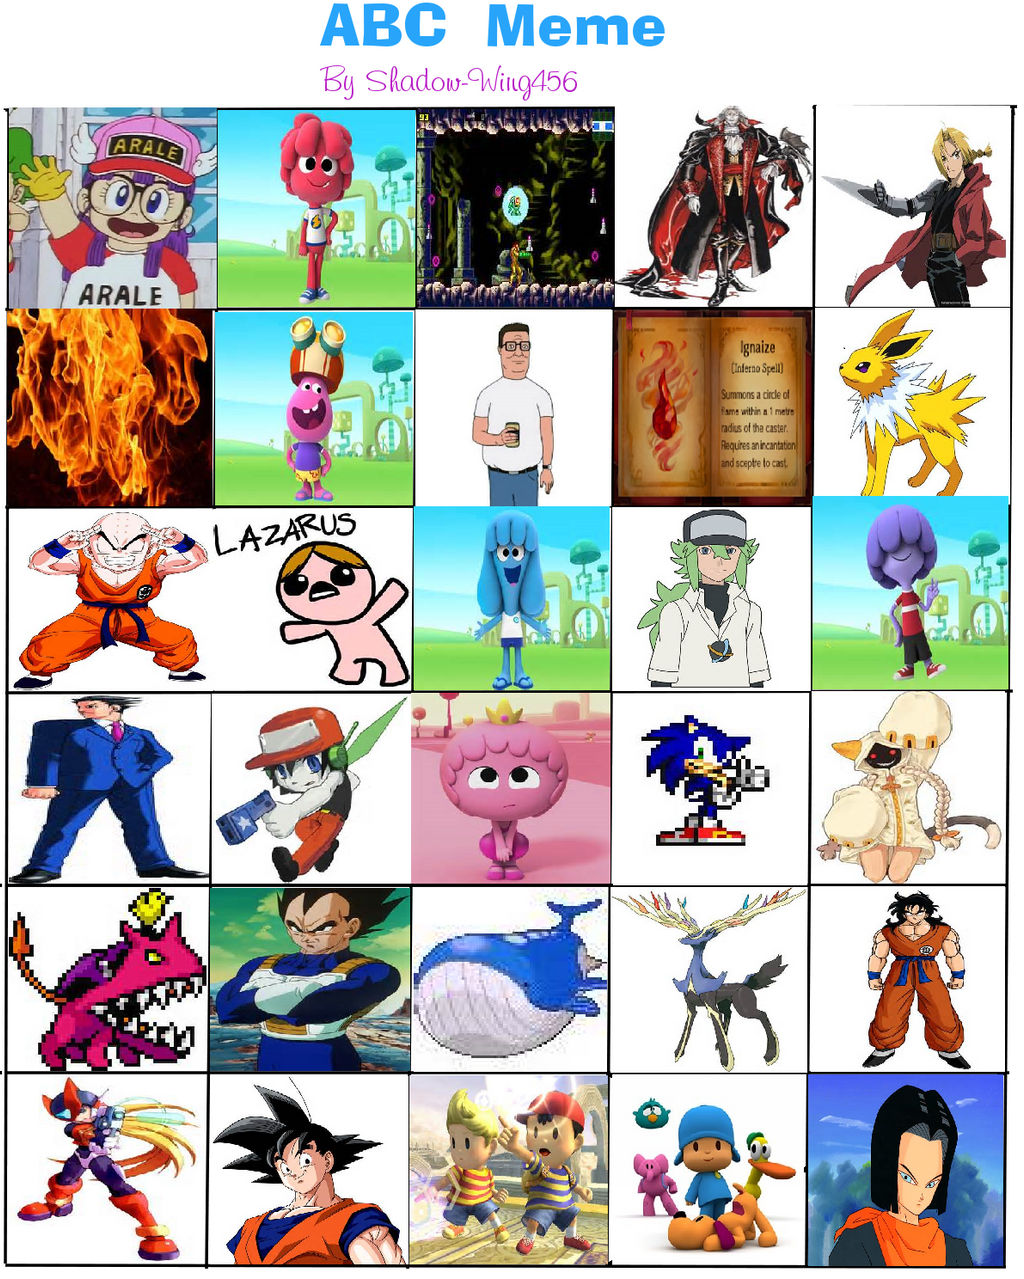 Abc Meme (soniclover562 version)